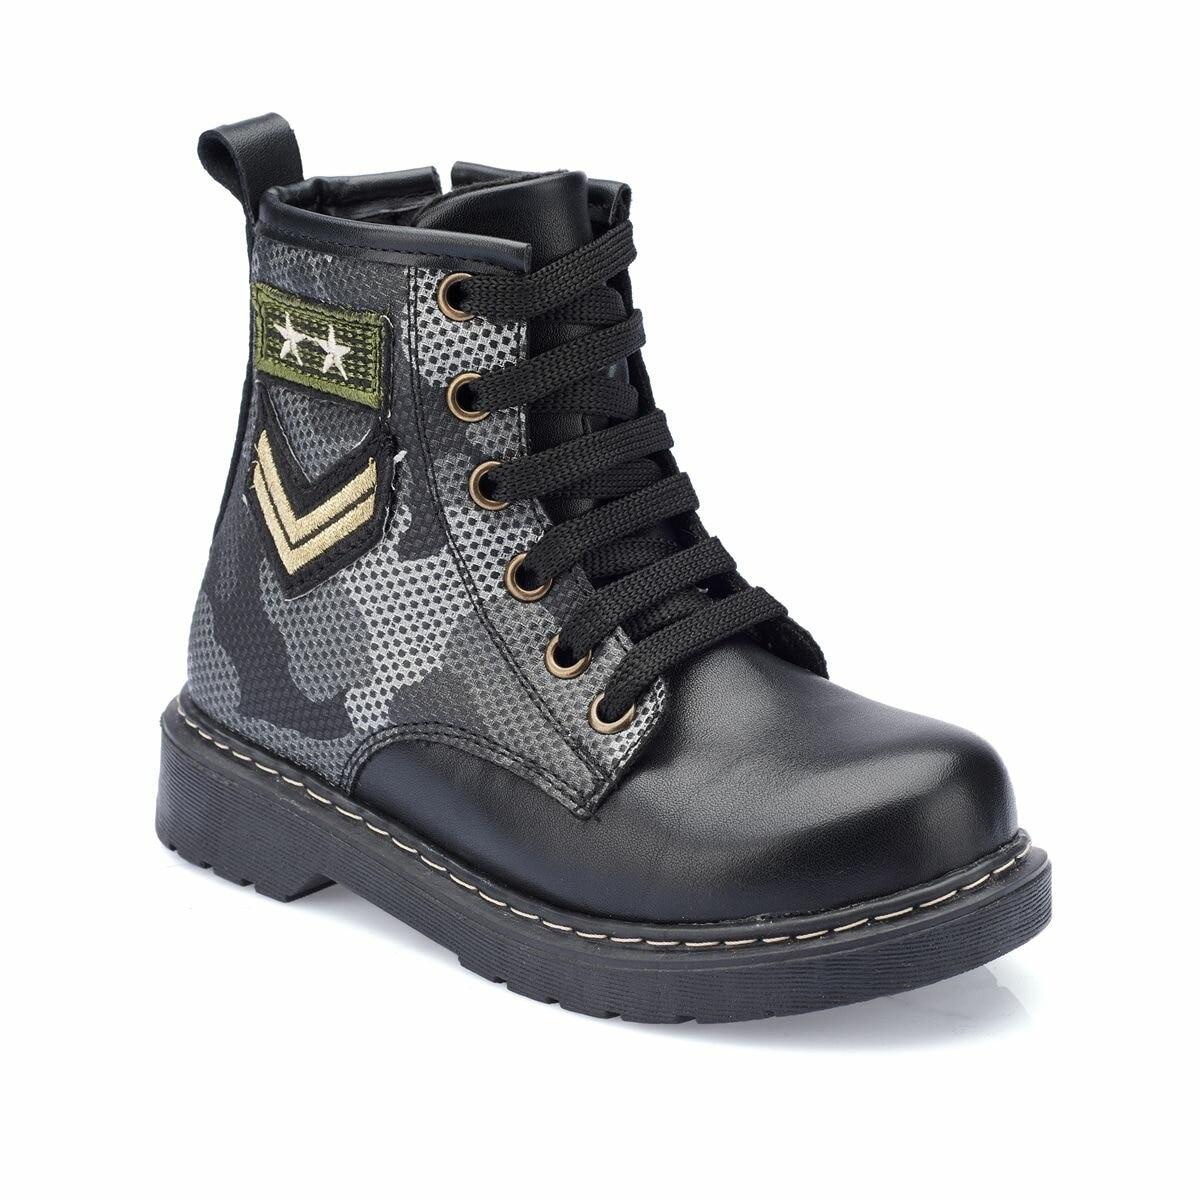 FLO 82.510550.P Black Male Child Boots Polaris